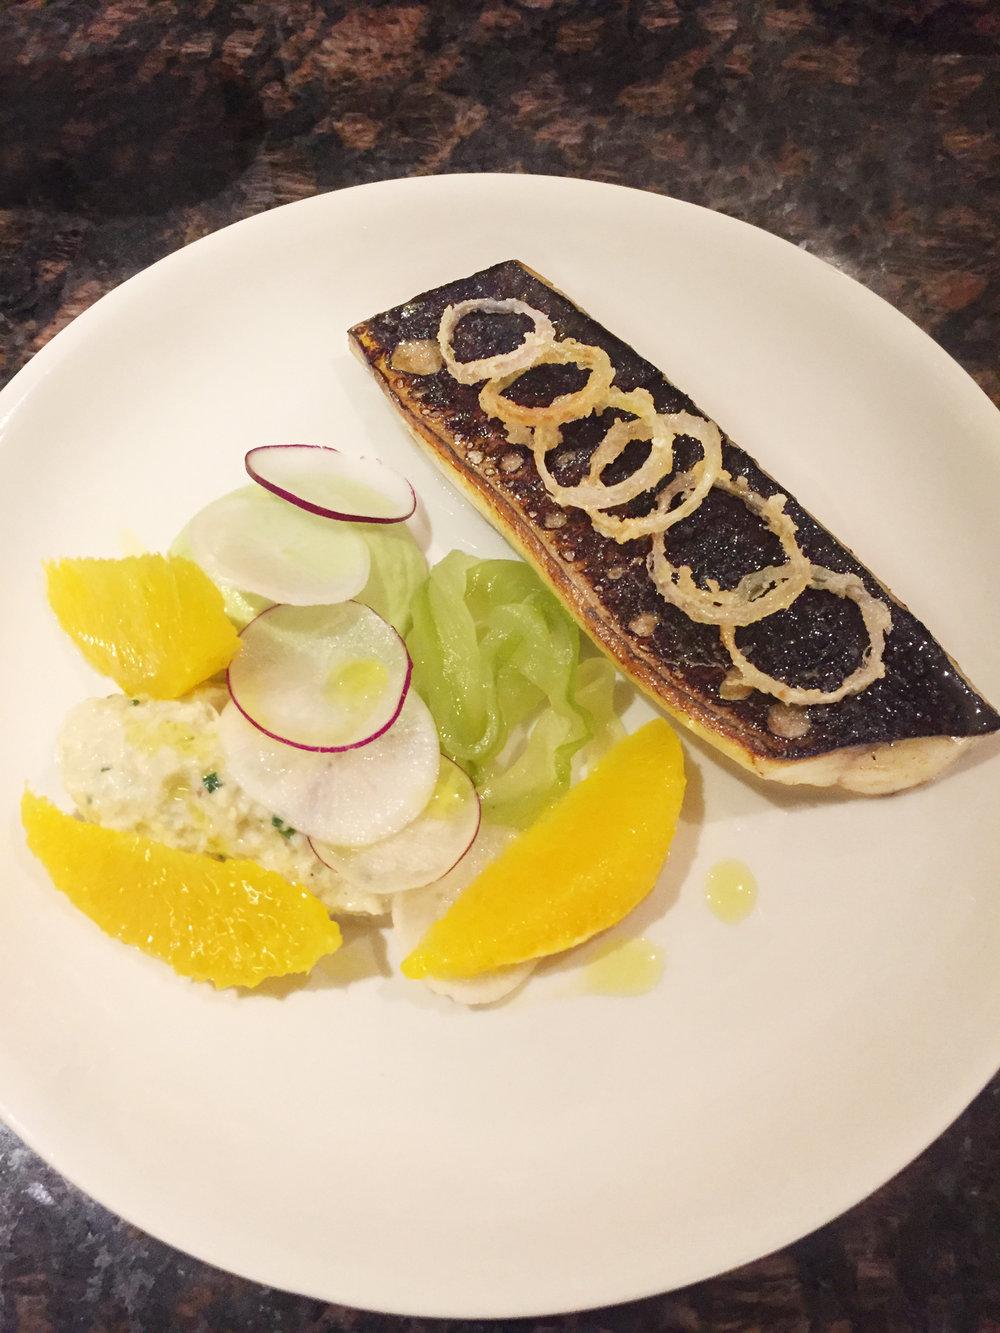 MackerelDish.jpg